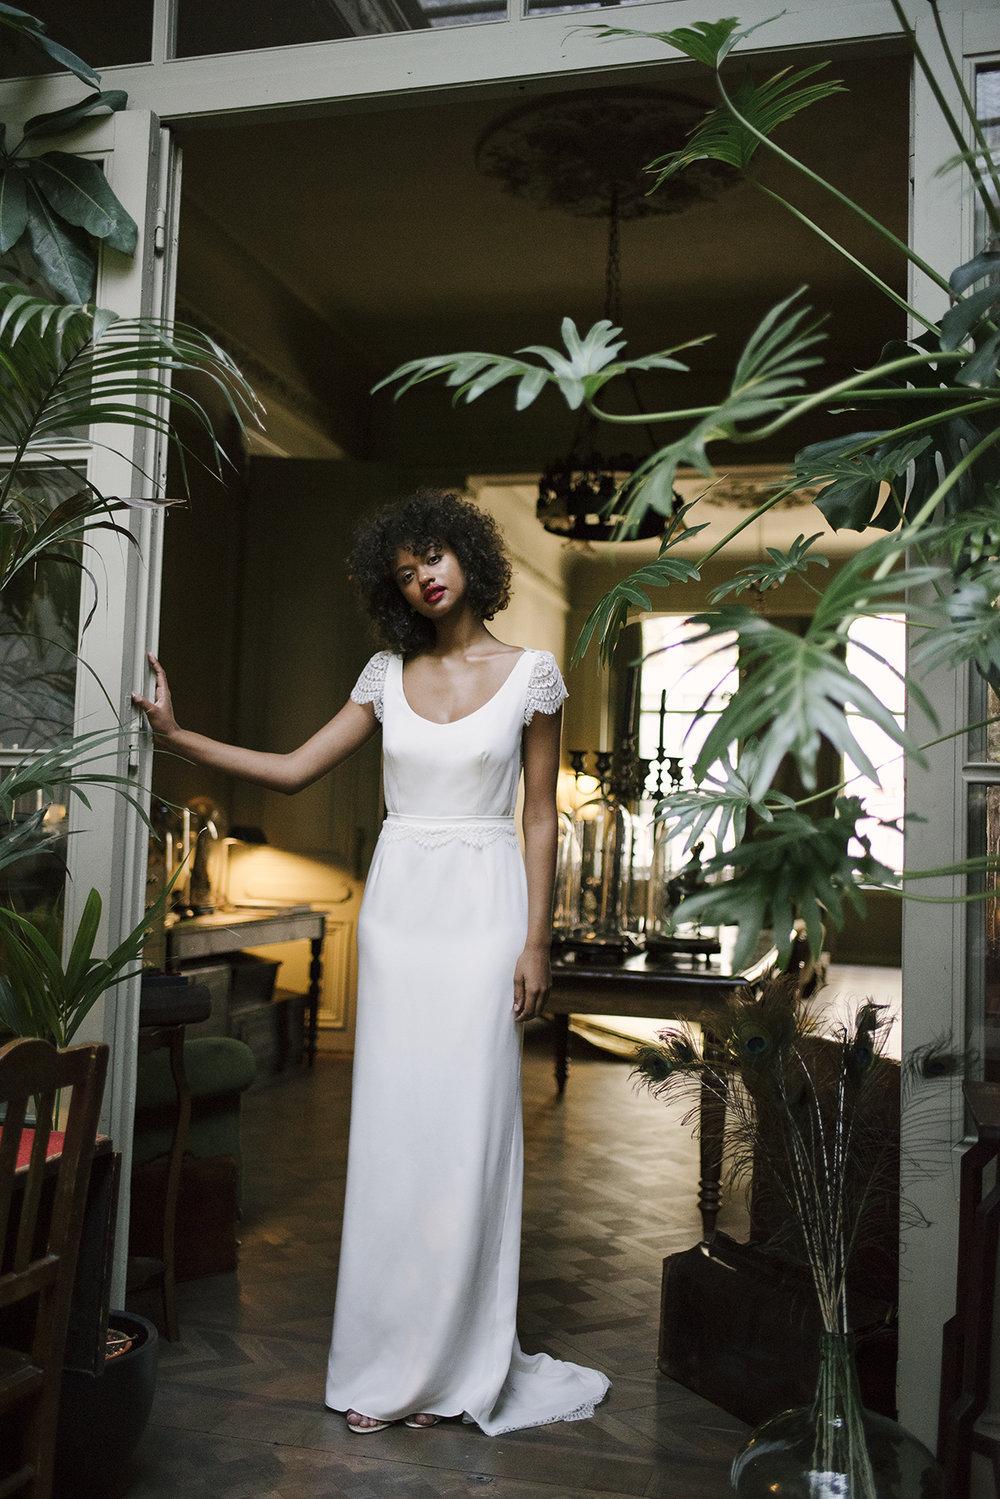 valentine-avoh-robe-mariee-dinah-dos-nu-wedding-dress-bruxelles-photo-elodie-timmermans-31.jpg